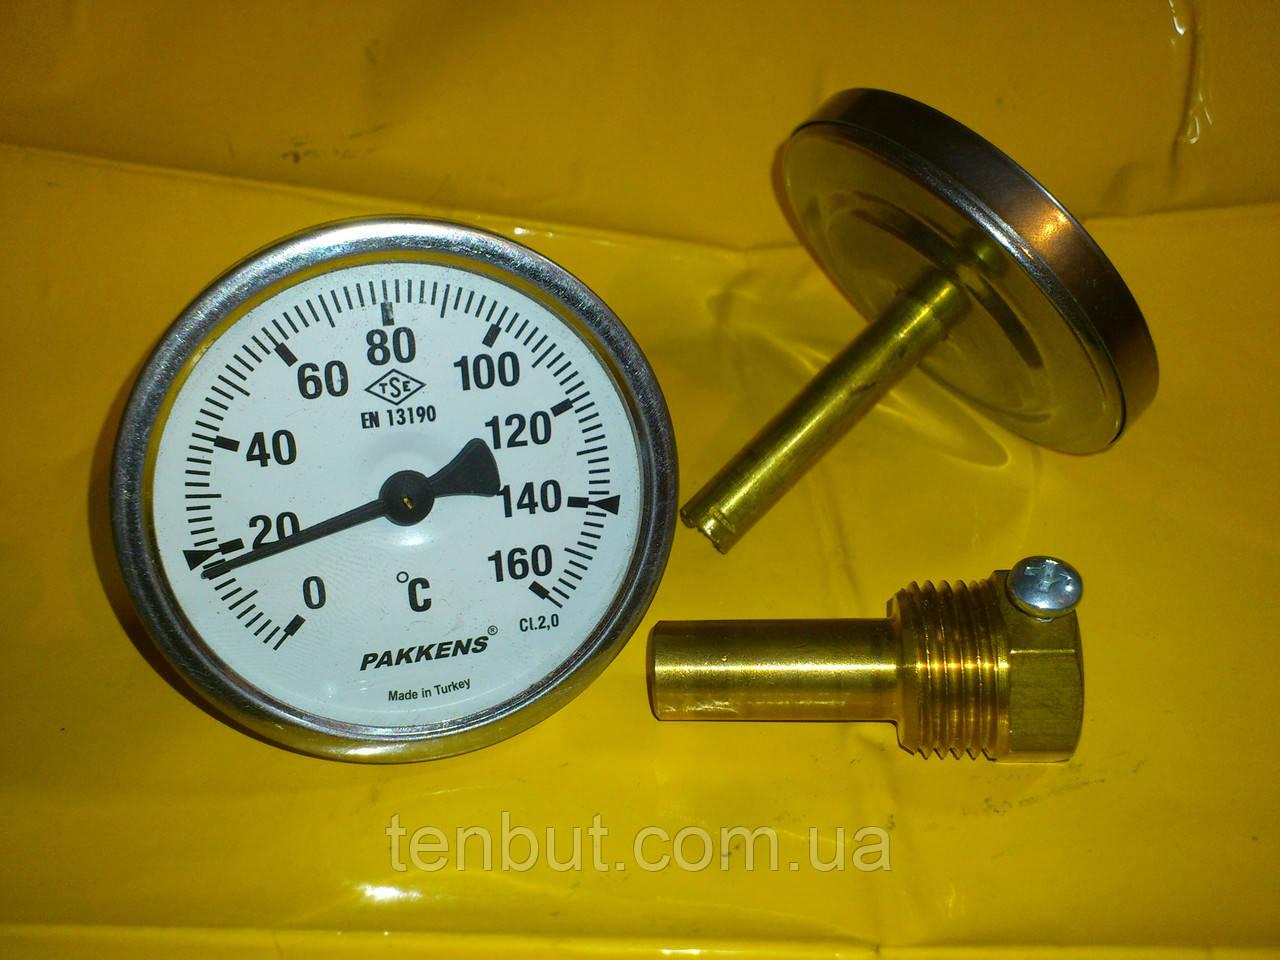 Термометр трубчатый PAKKENS  0-160°C град. / диаметр Ø 63 мм./ длина 50 мм.